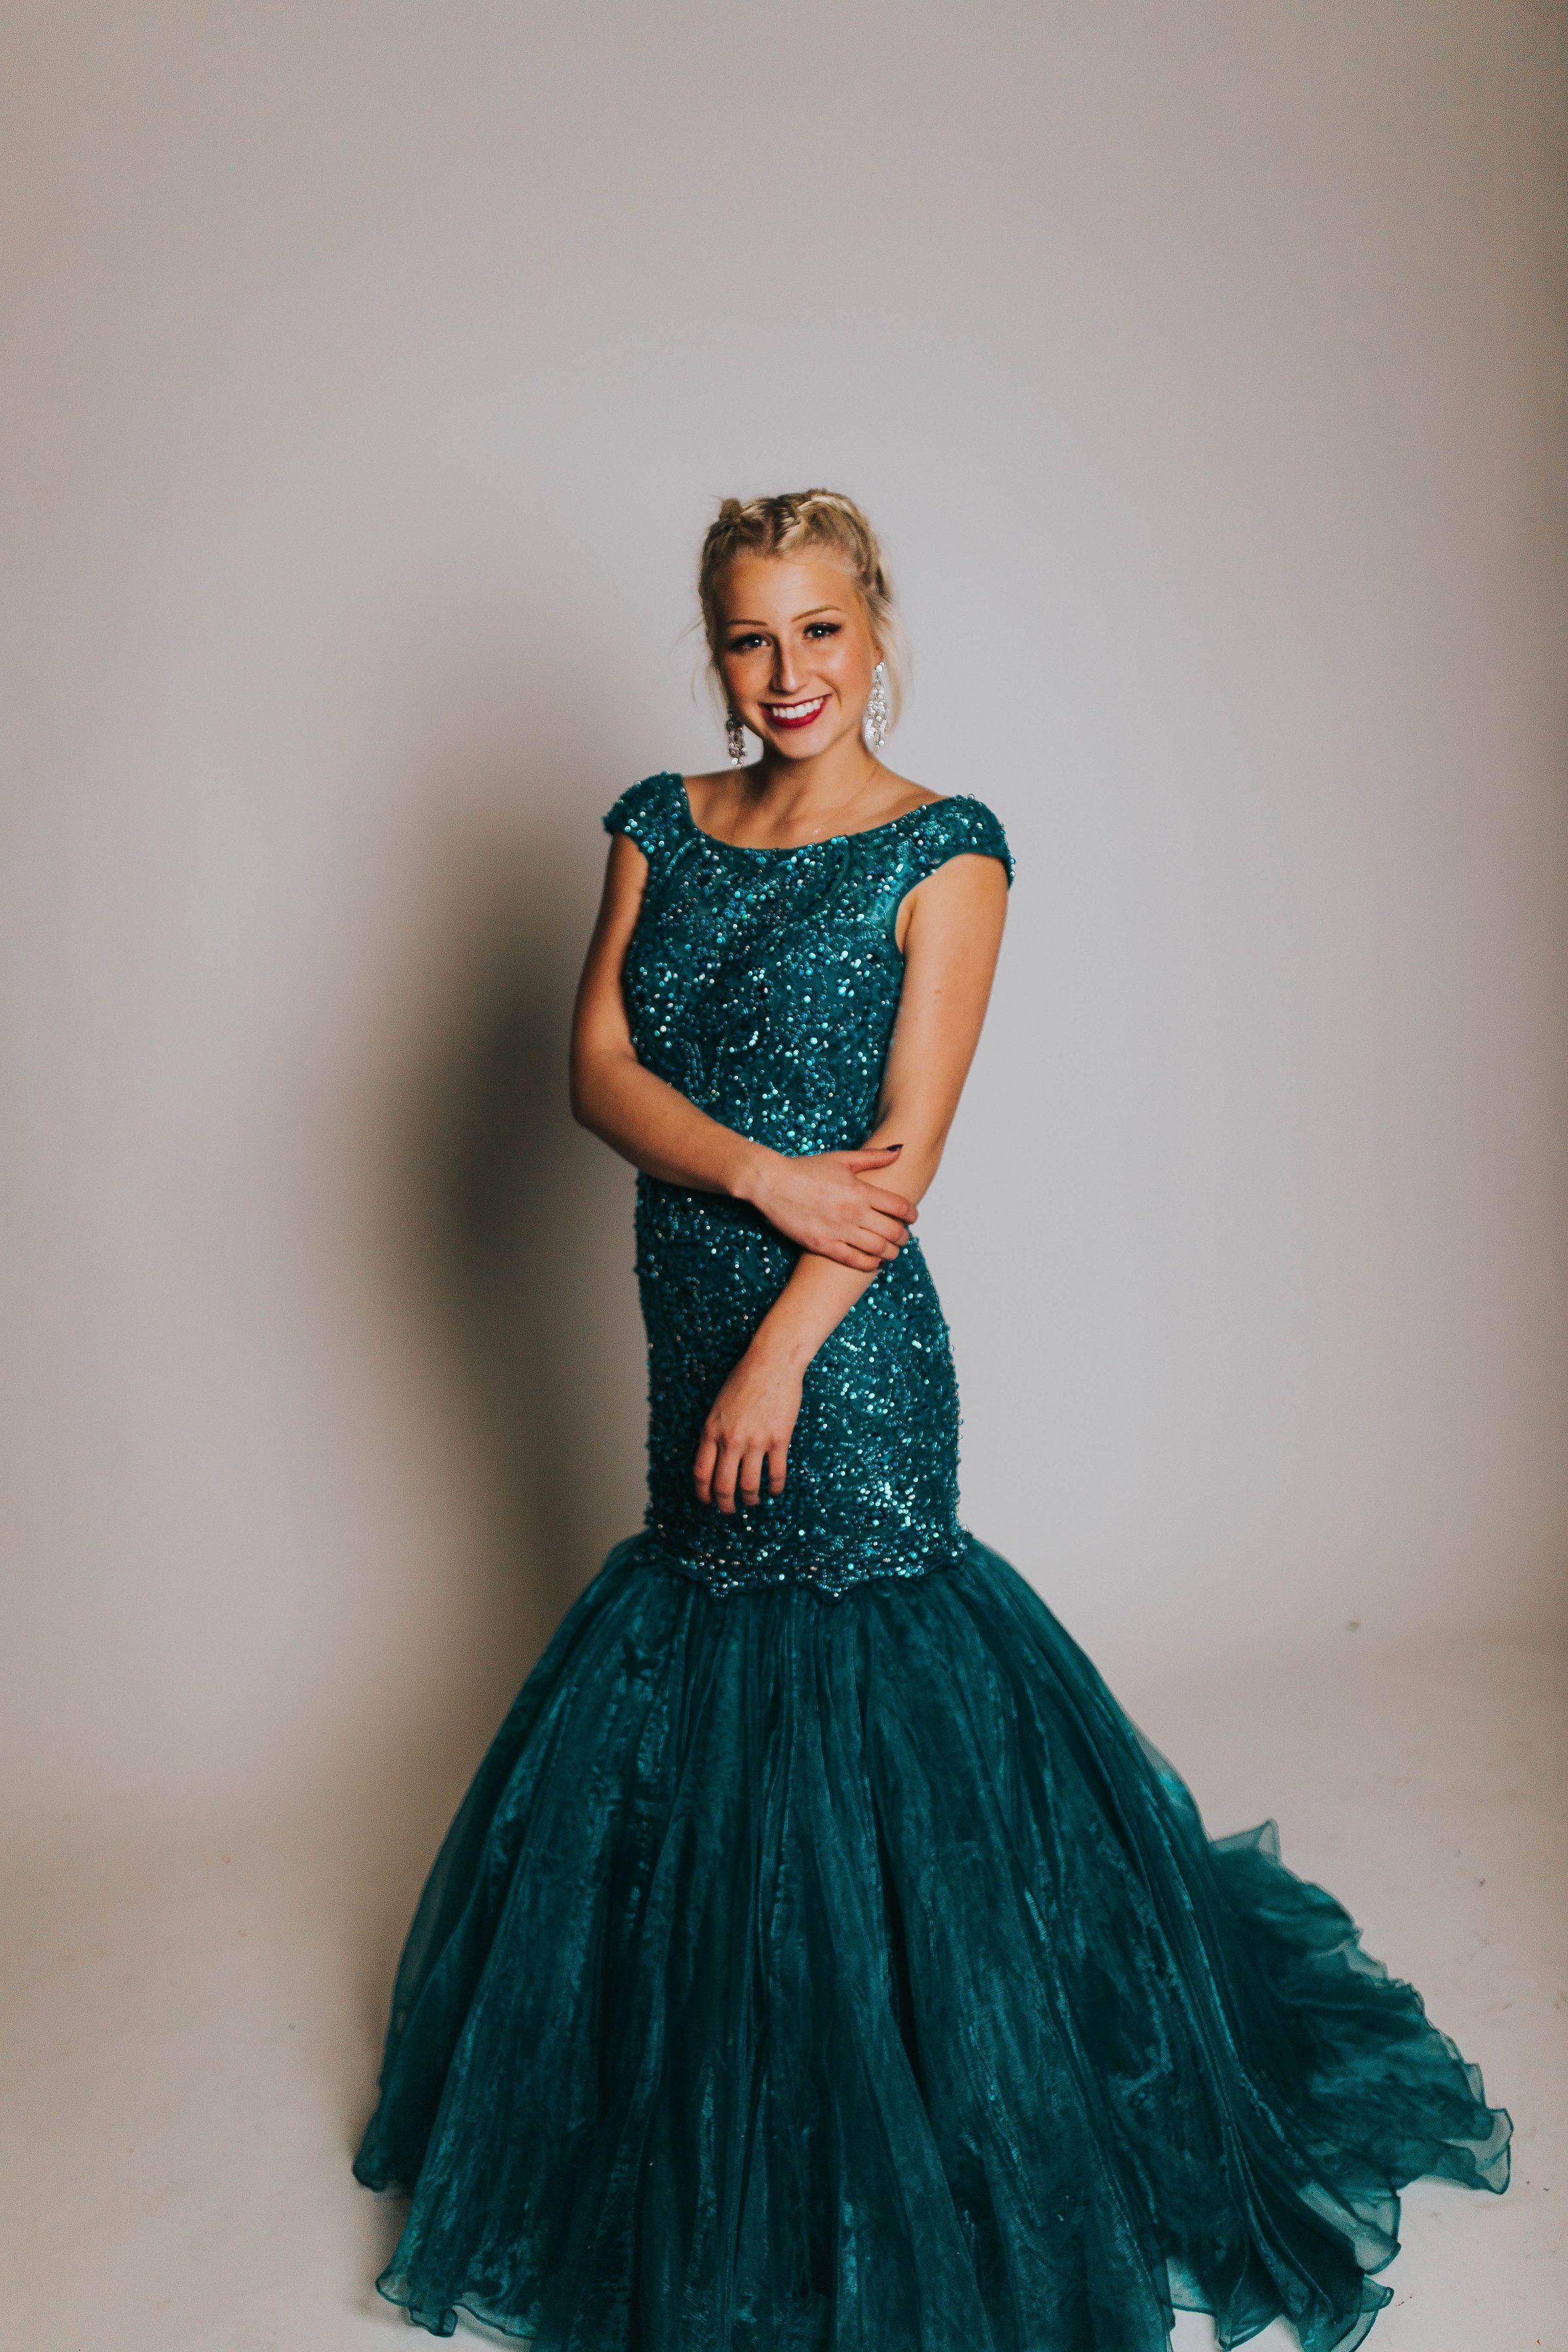 Turquoise Beaded Dress